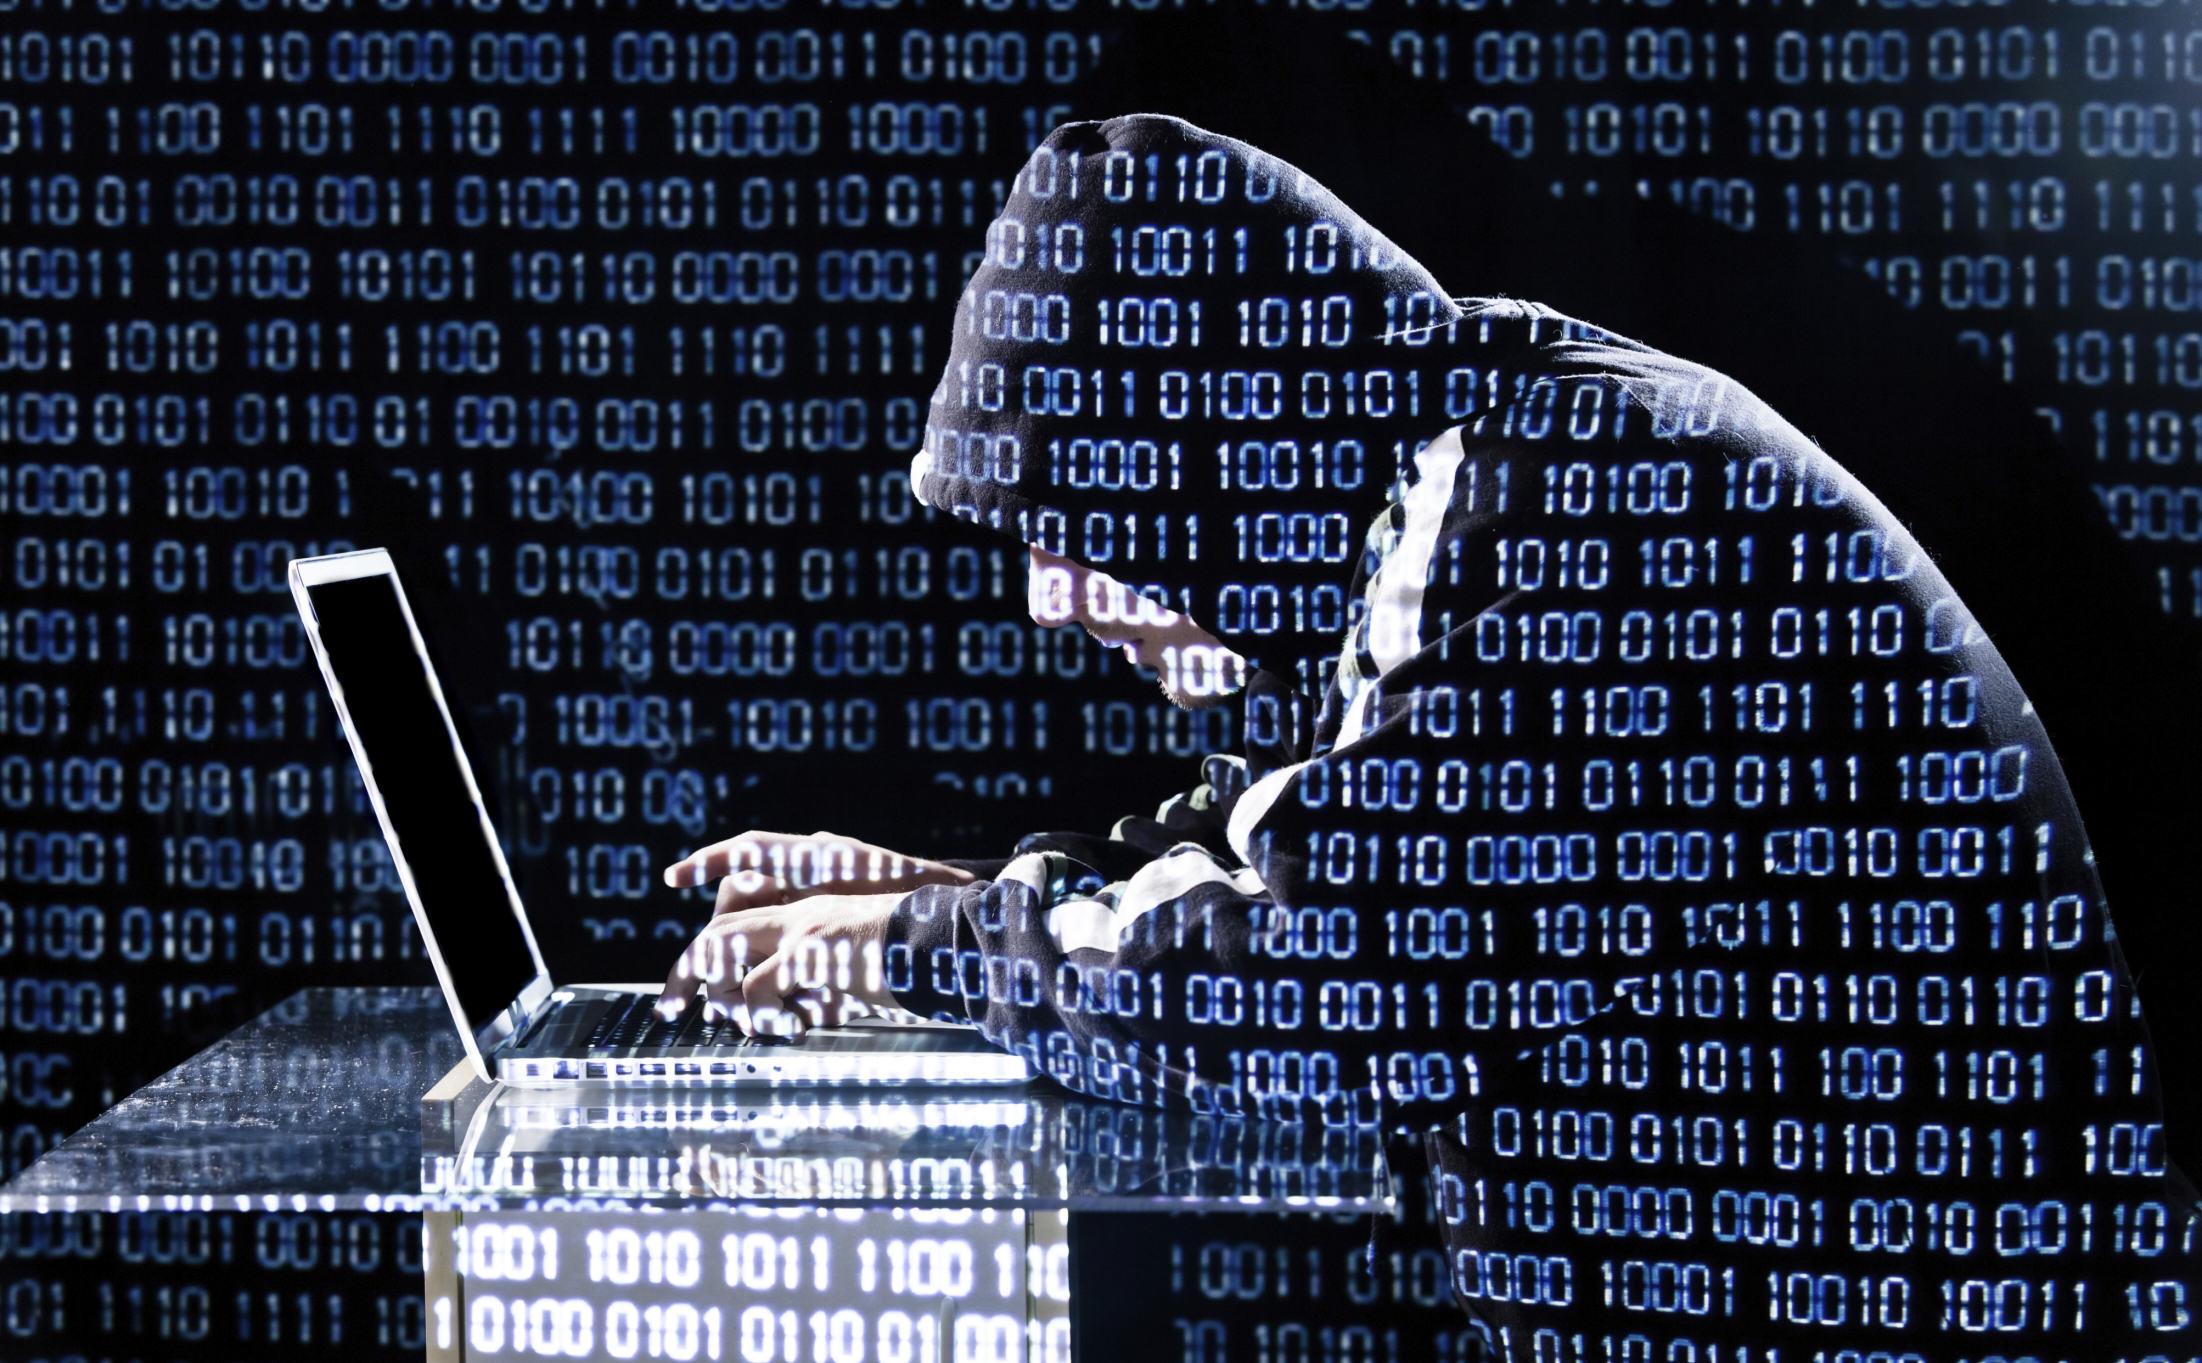 Atak hakera na kryptowalutę